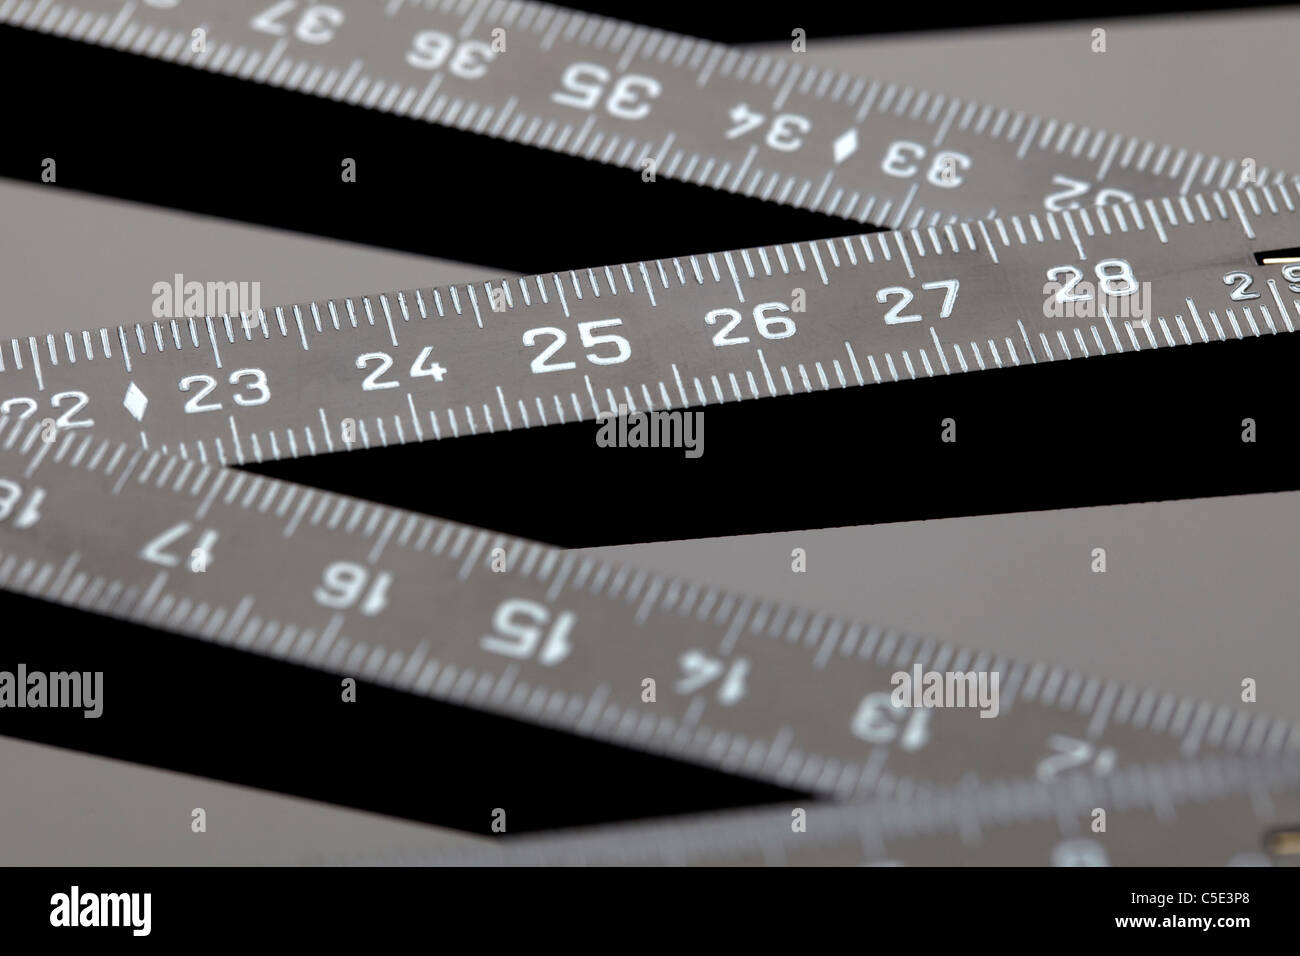 Detail shot of a black folding rule - Stock Image